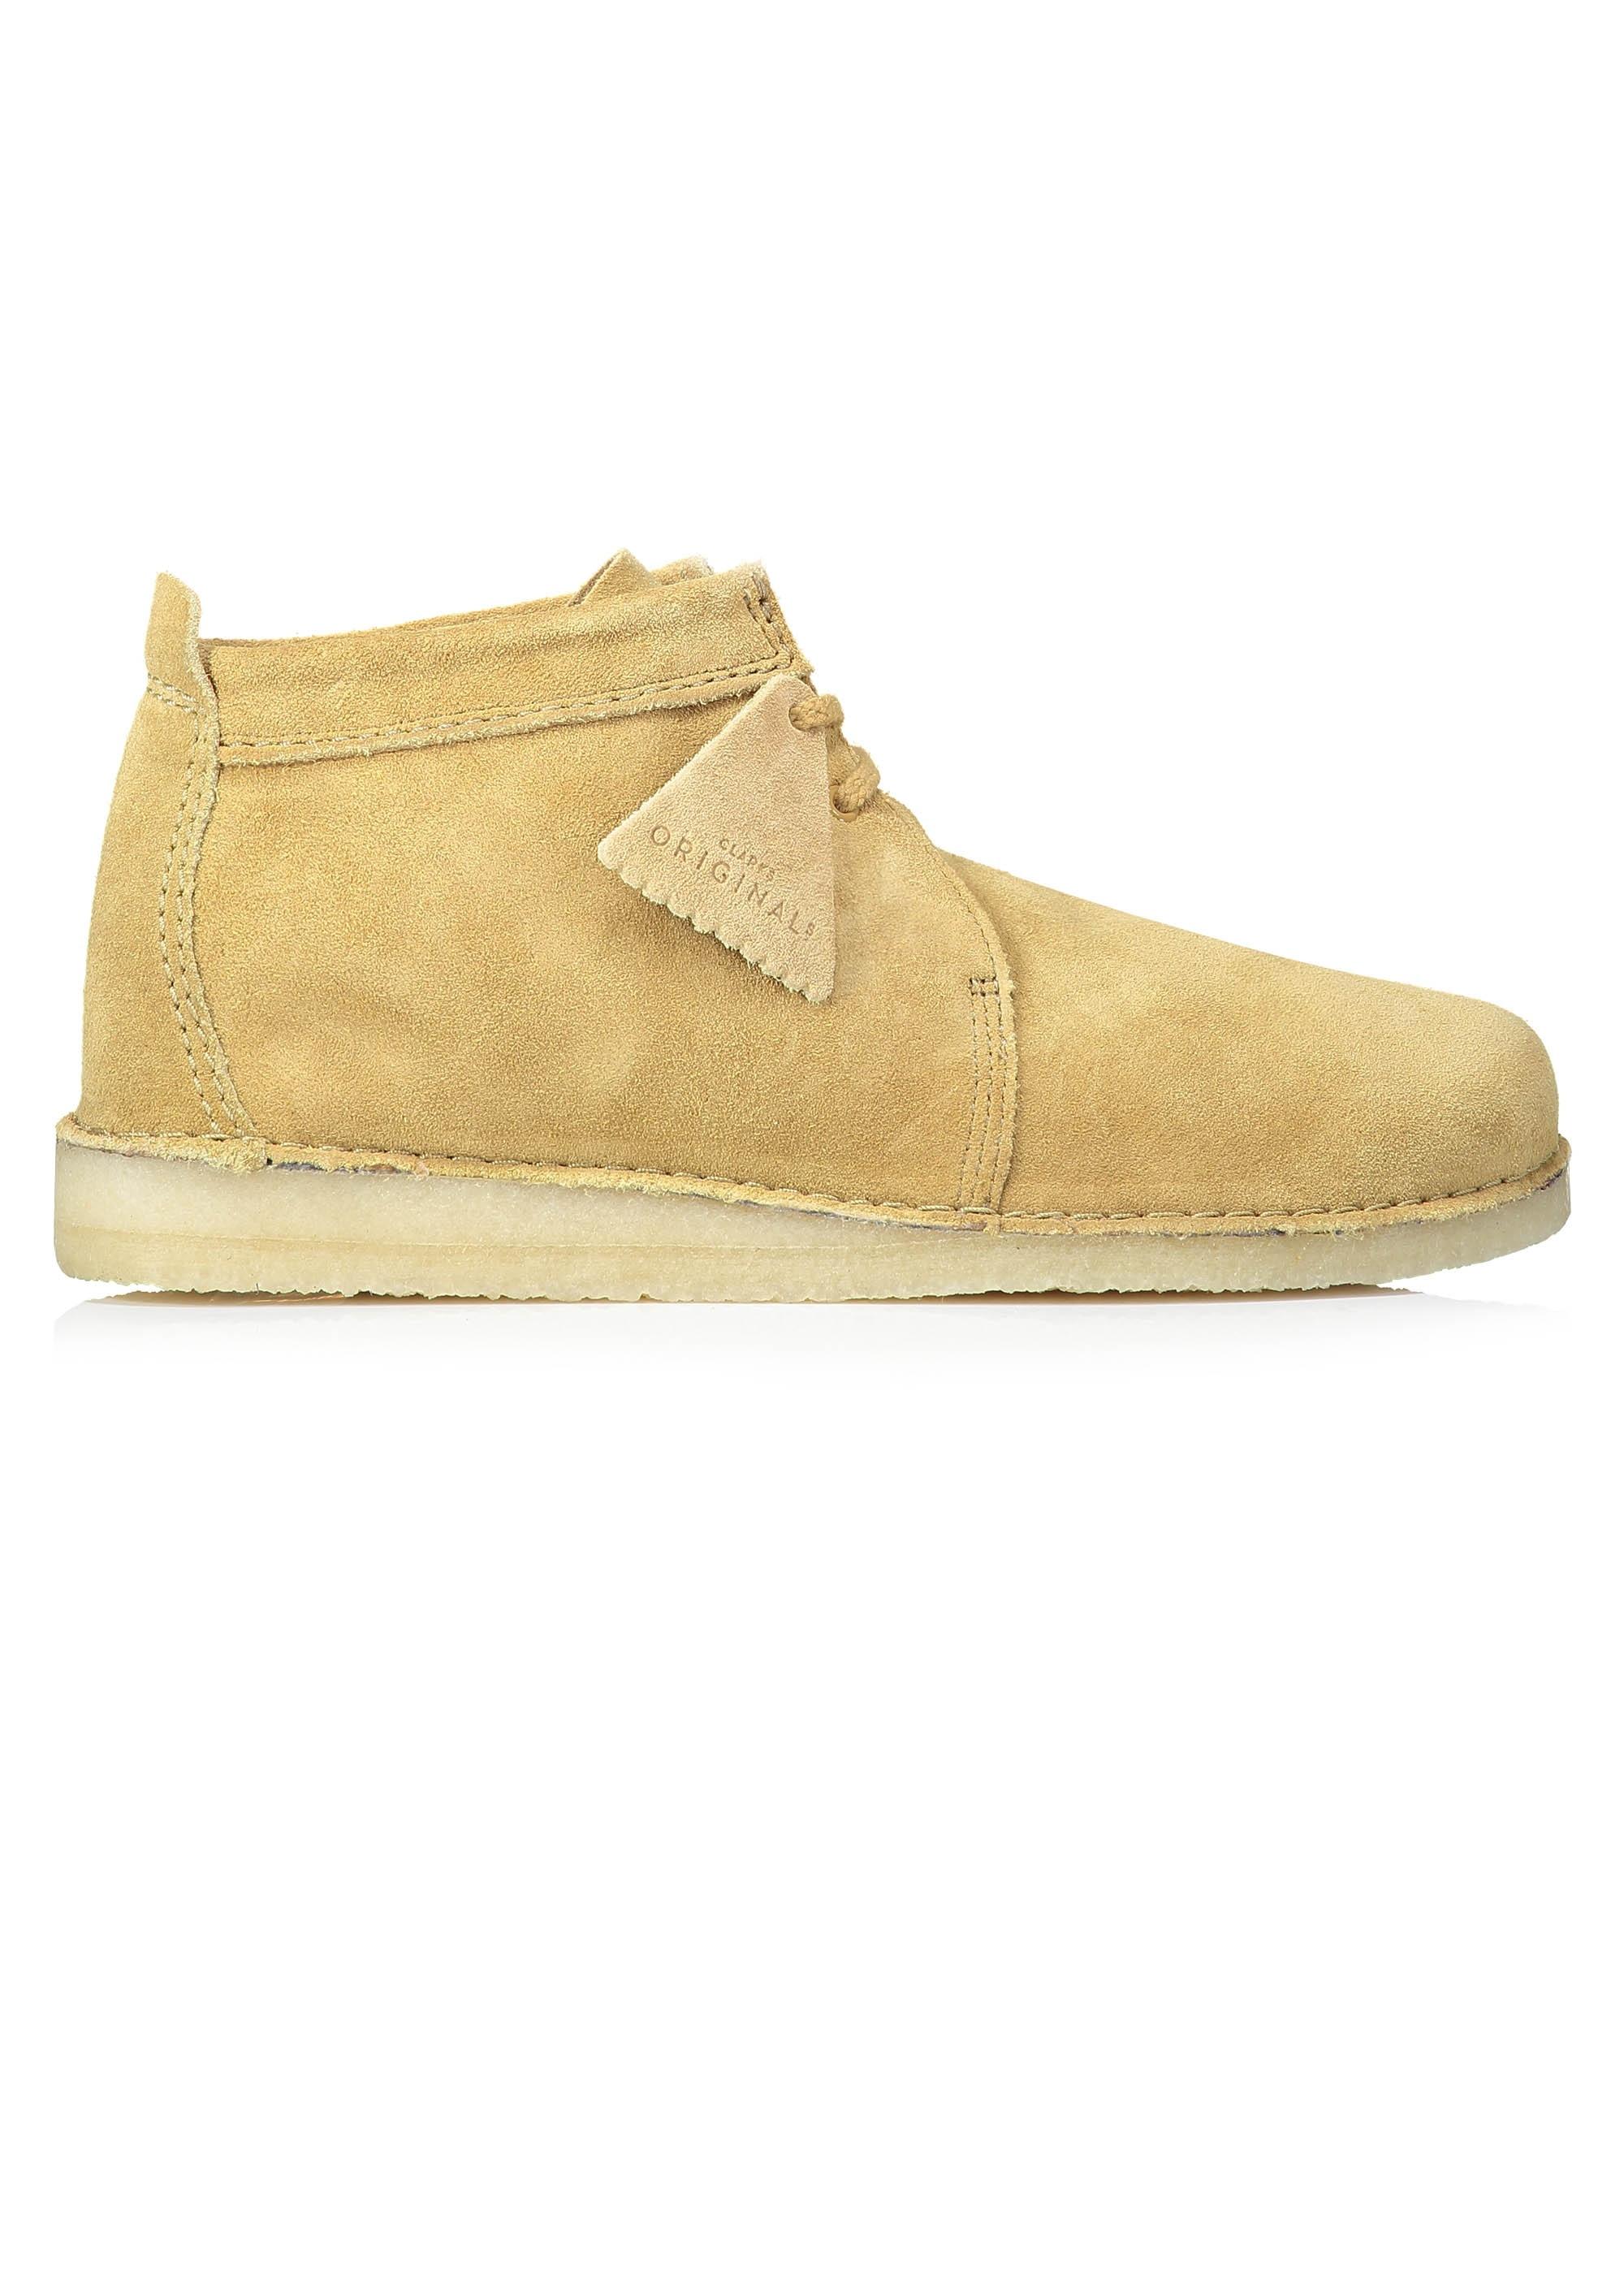 Clarks Originals Ashton Boot - Proper